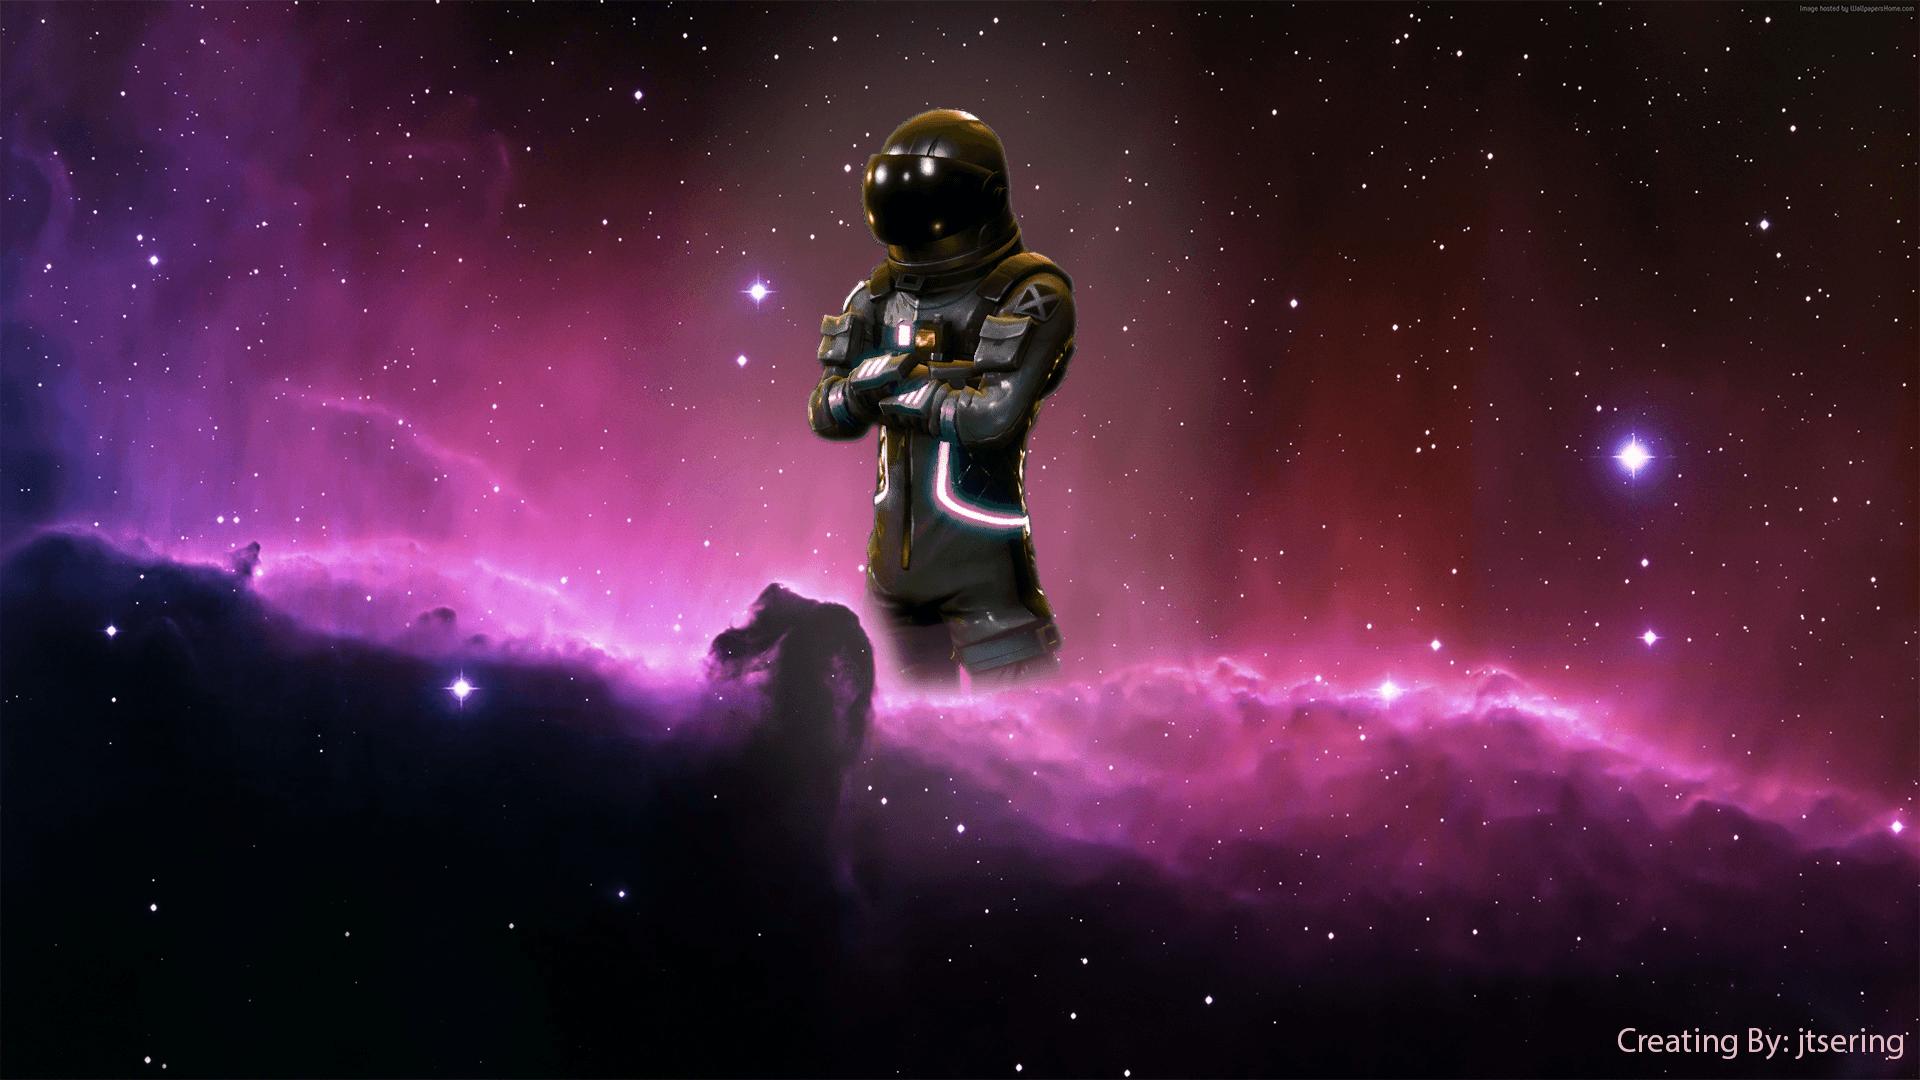 Dark Voyager Fortnite Wallpapers Top Free Dark Voyager Fortnite Backgrounds Wallpaperaccess